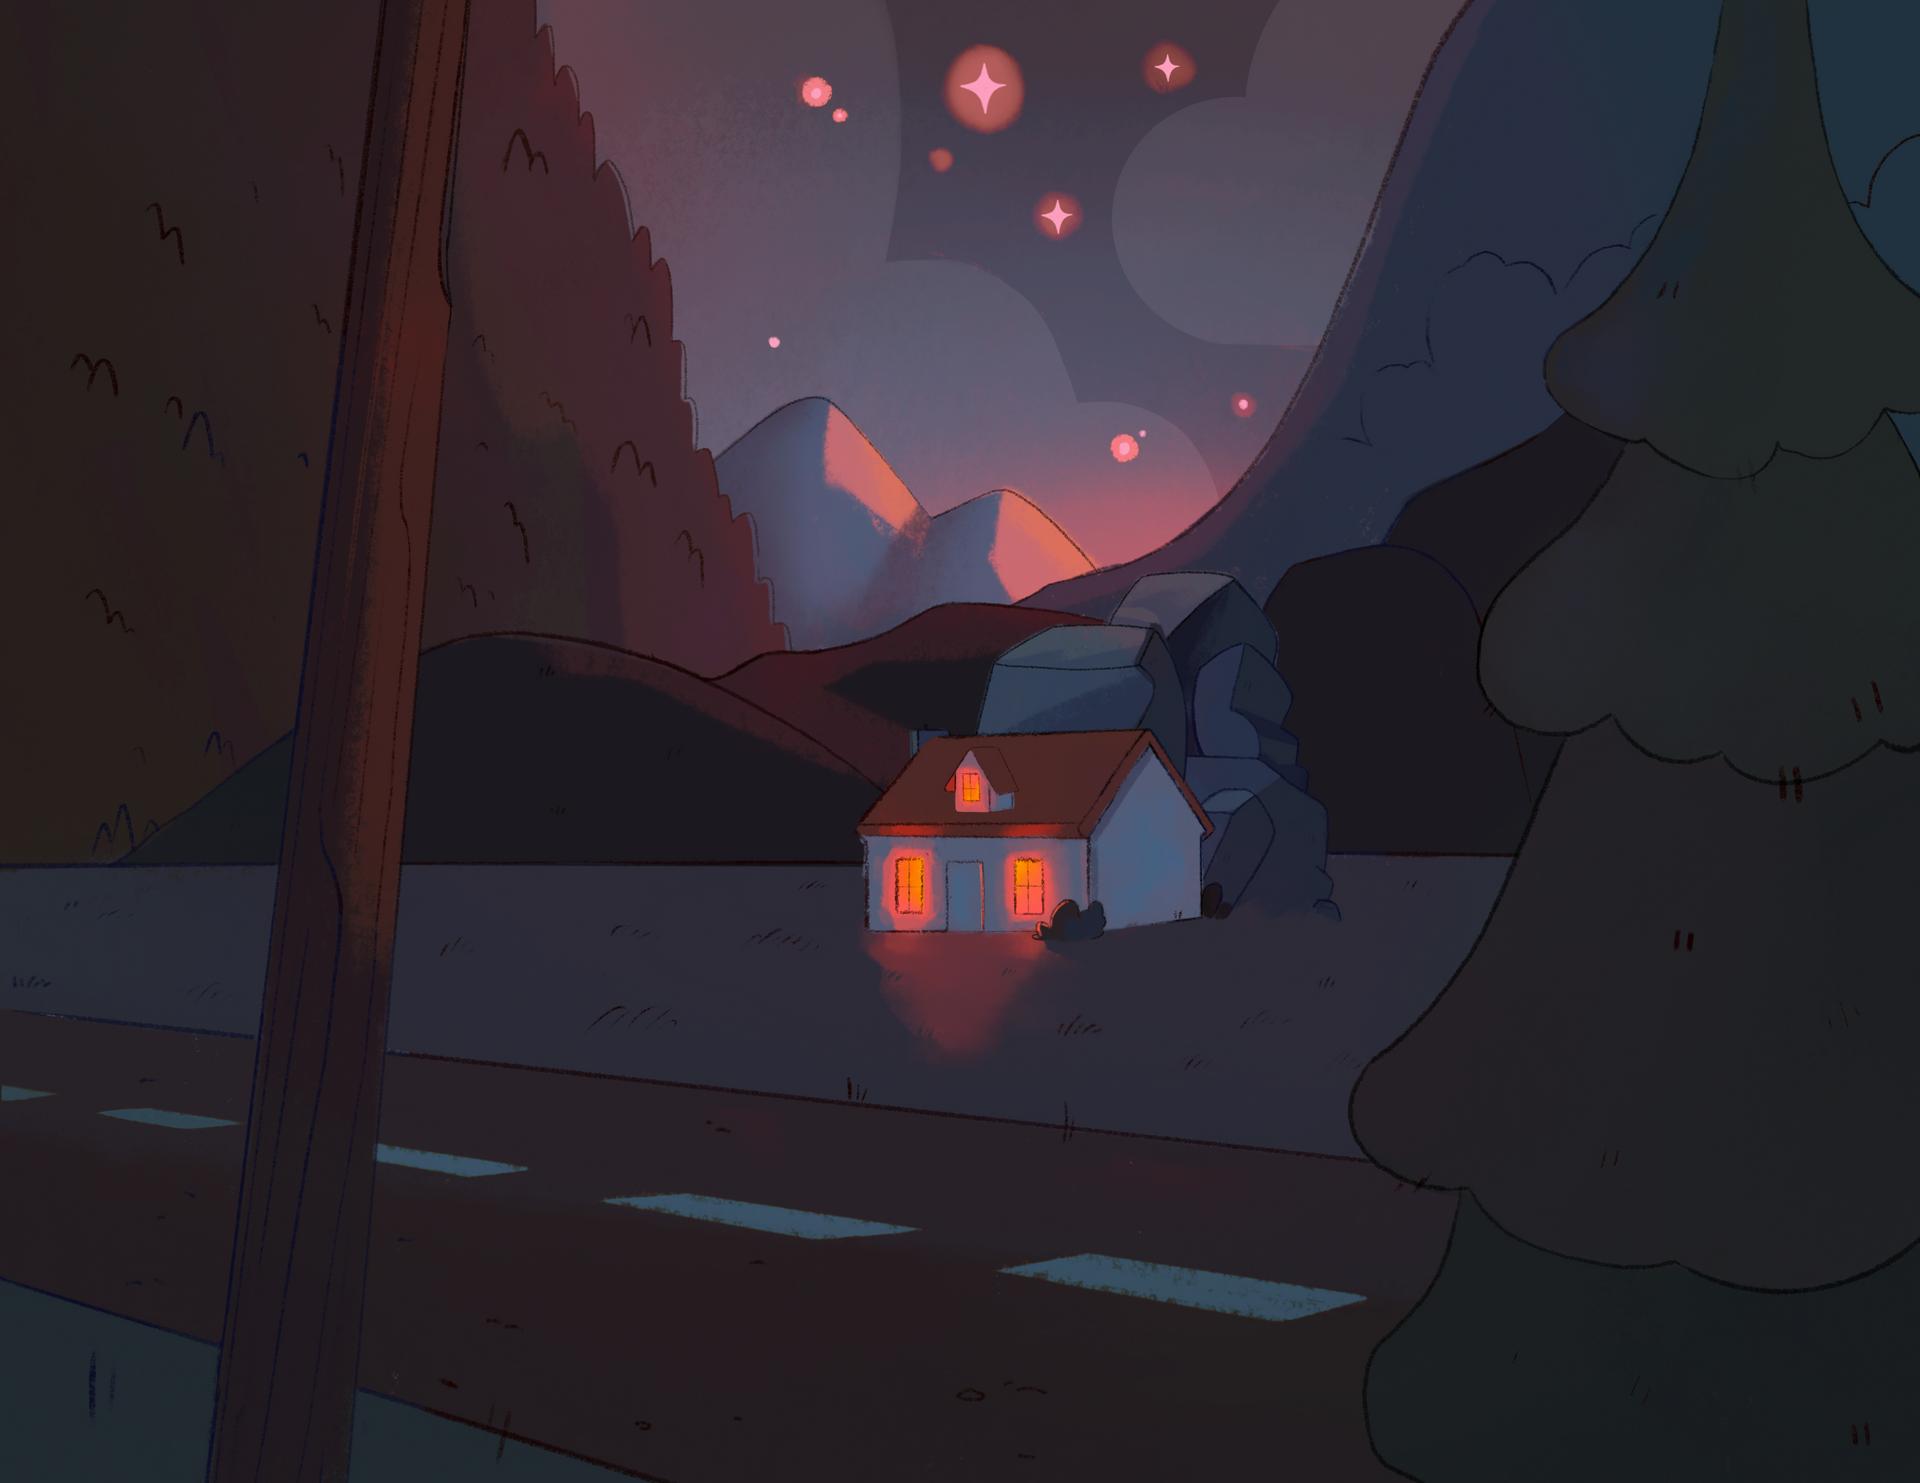 Warm Mountain Night